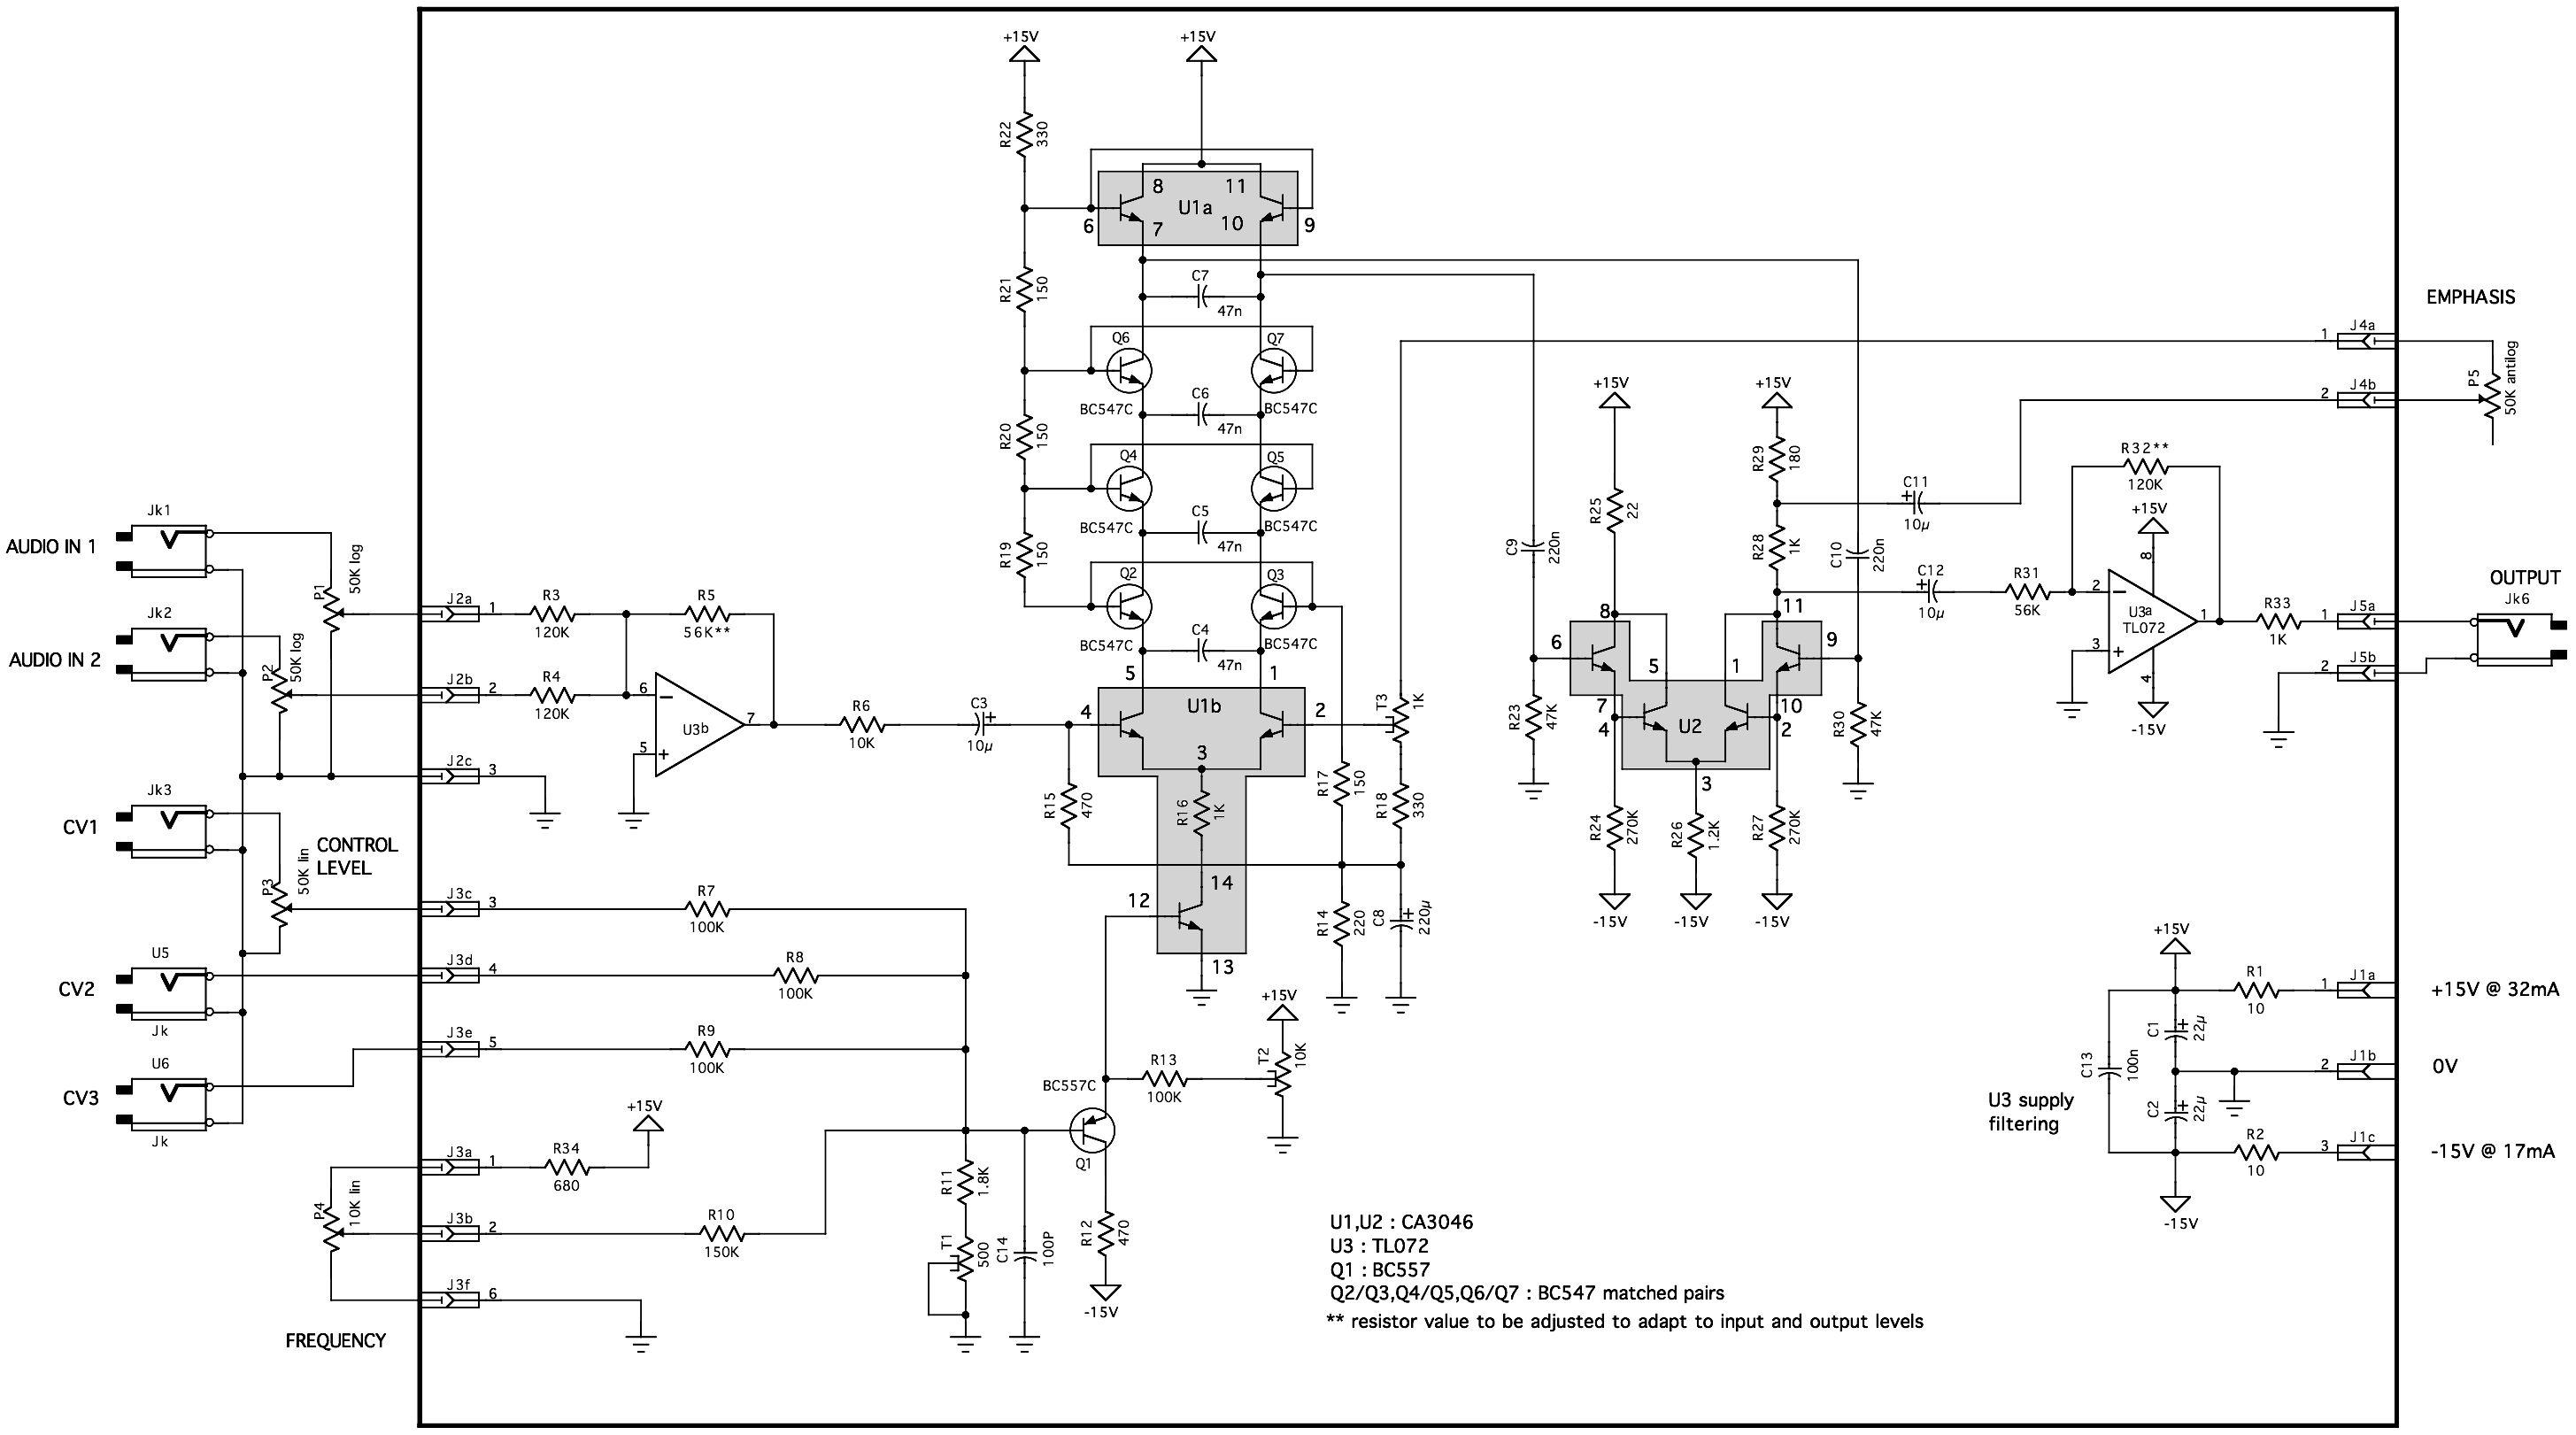 Diagram passive summing mixer schematic wurlitzer jukebox schematics diagram passive summing mixer schematic wurlitzer jukebox schematics rh hannalupi co ccuart Choice Image